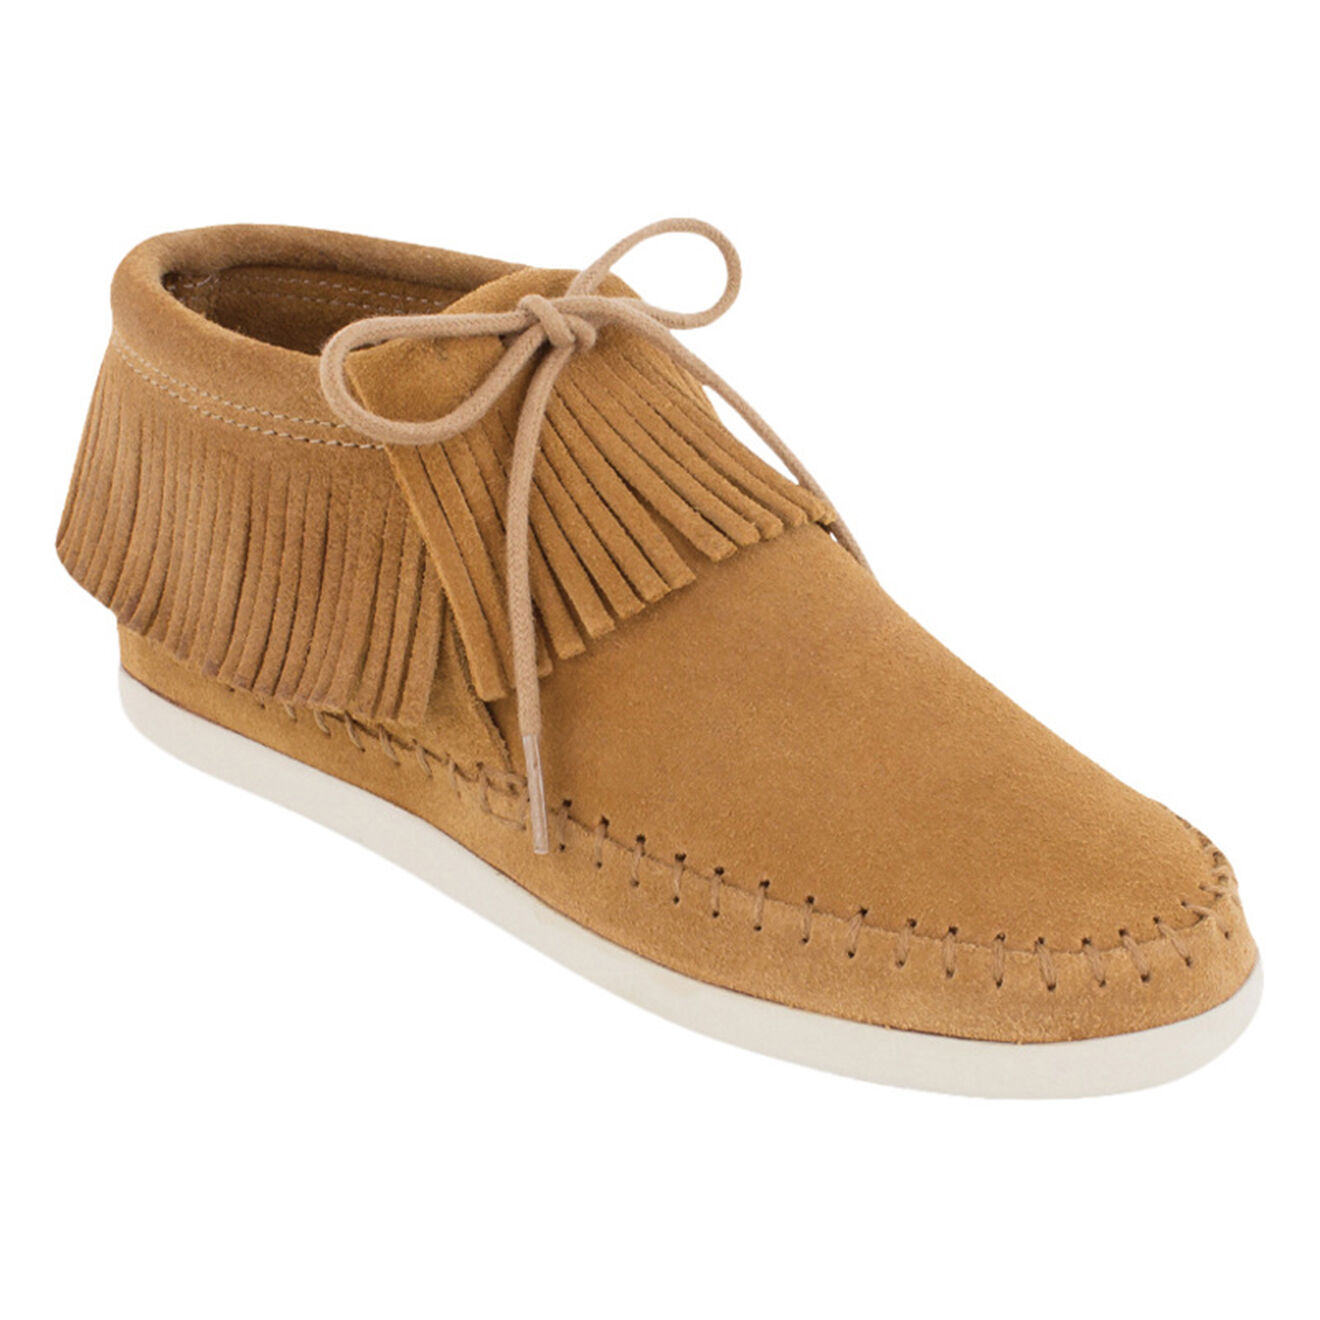 Boots en Velours de Cuir Venice taupe - Minnetonka - Modalova